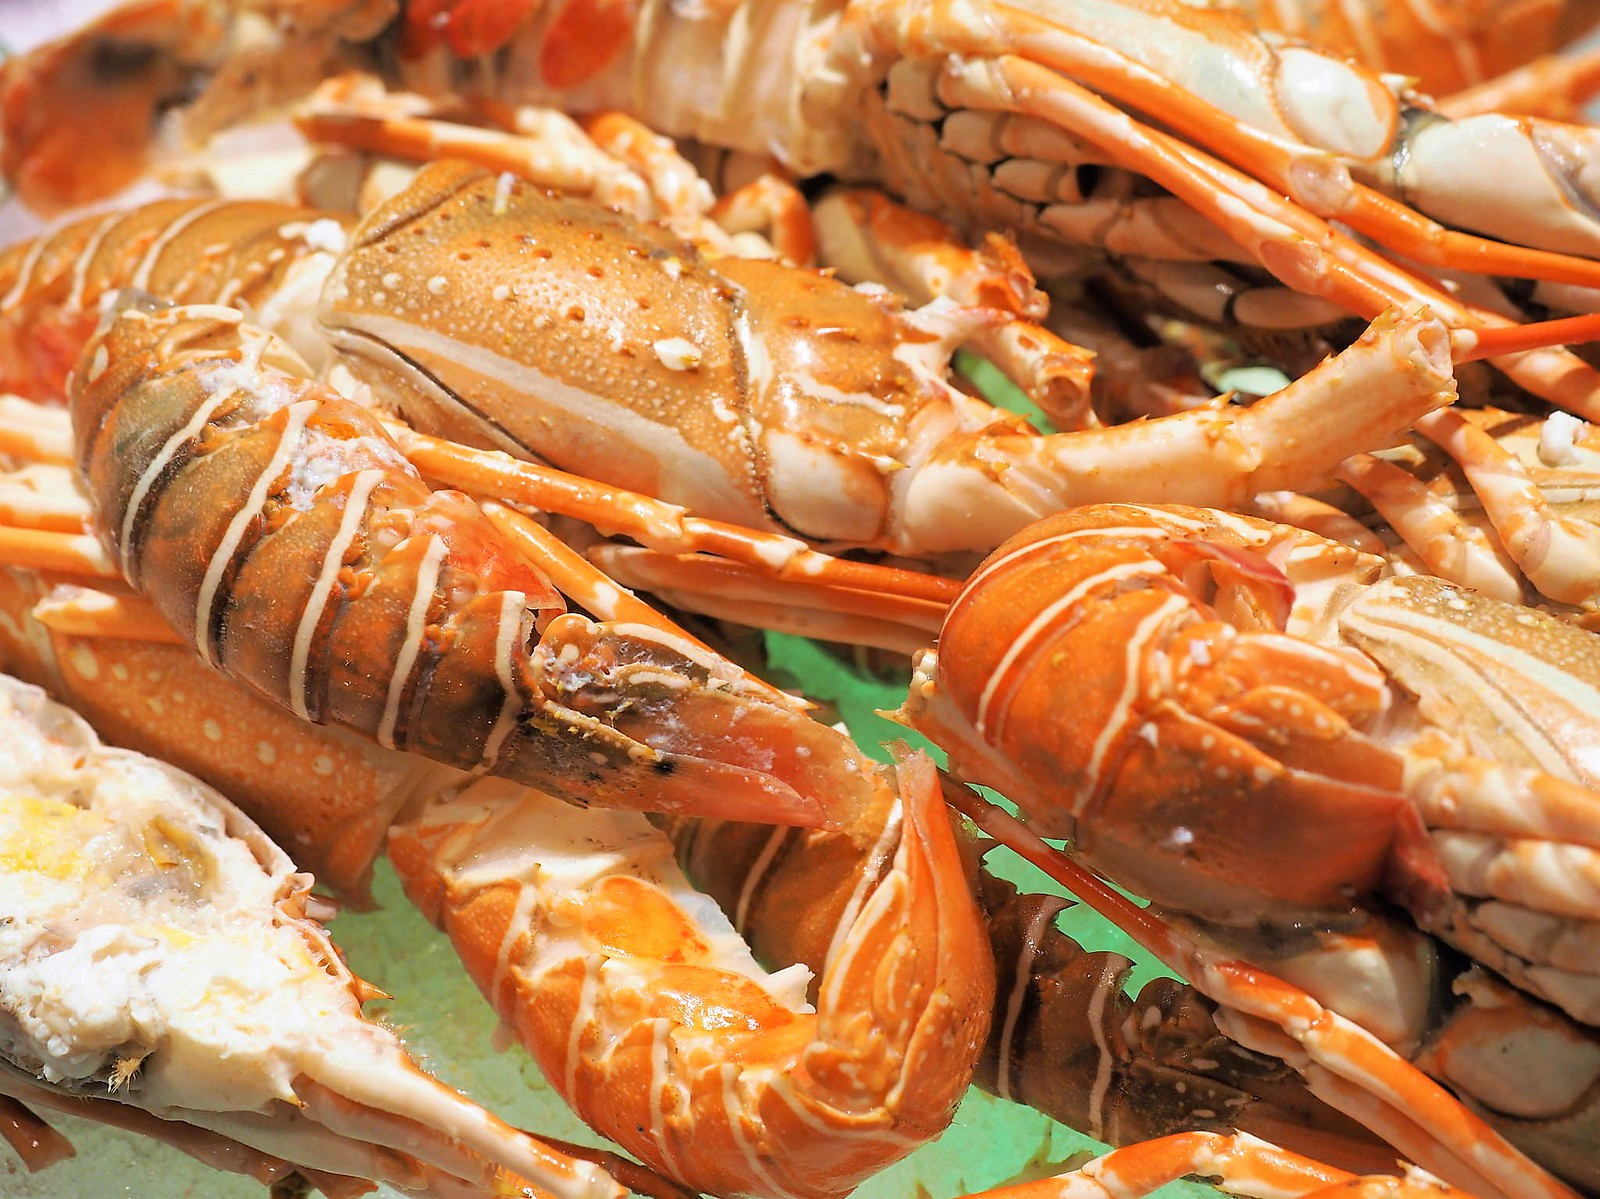 Baby lobster on ice at Feast @ Sheraton Petaling Jaya